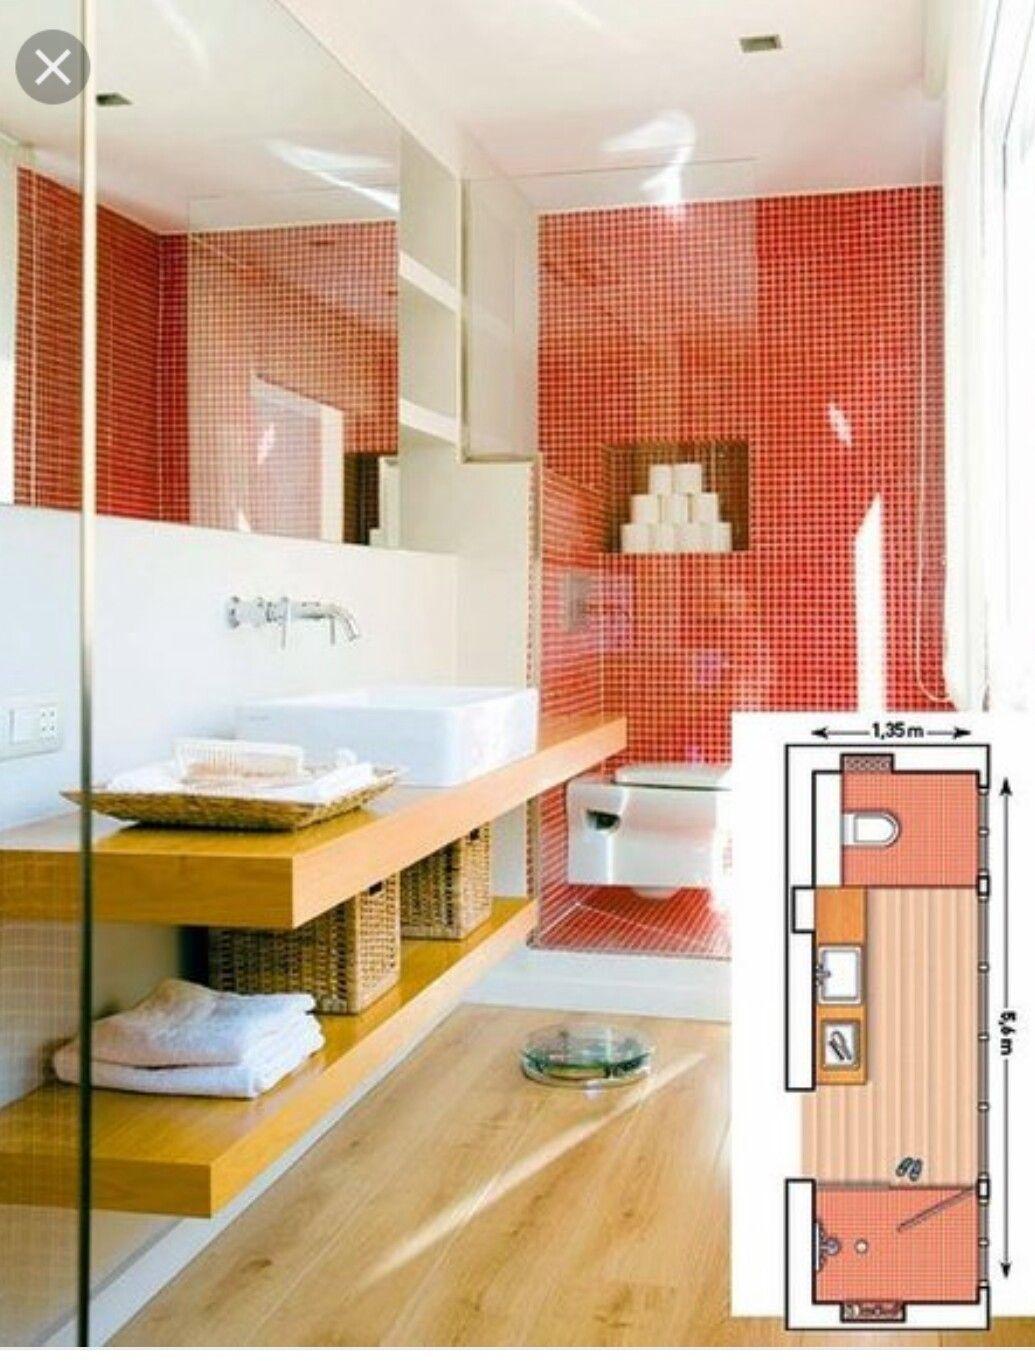 Mocheta ducha | BAÑOS16 | Pinterest | Duchas de baño, Baños y Baño